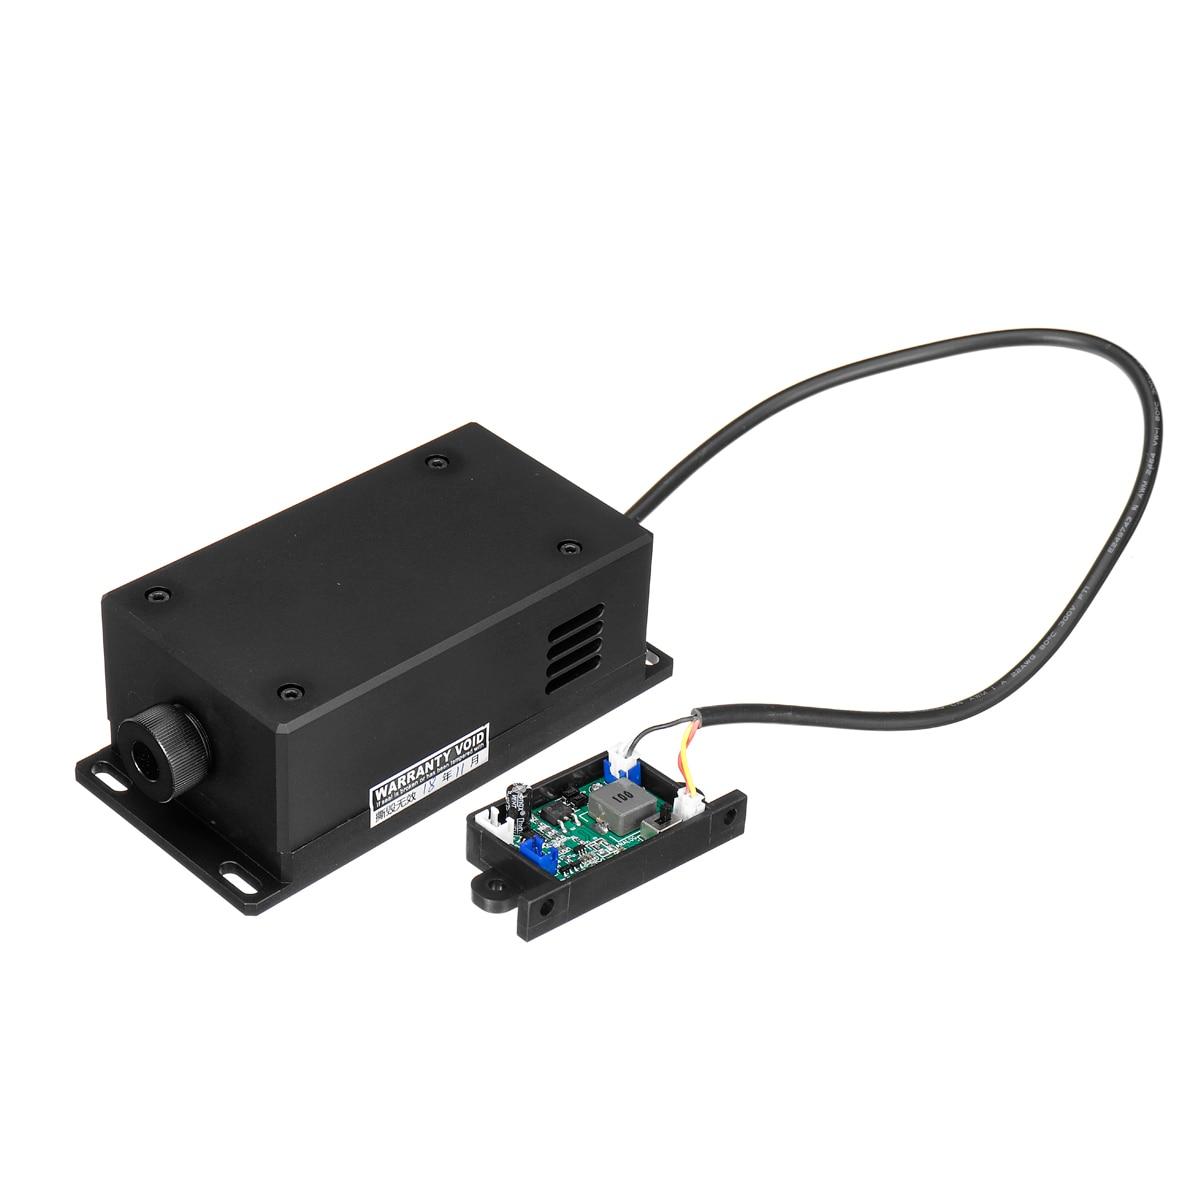 450/445nm 17 W 17000 mw alta potencia láser cabeza grabado módulo ajustable Focal azul láser módulo DIY madera máquina de grabado de Metal